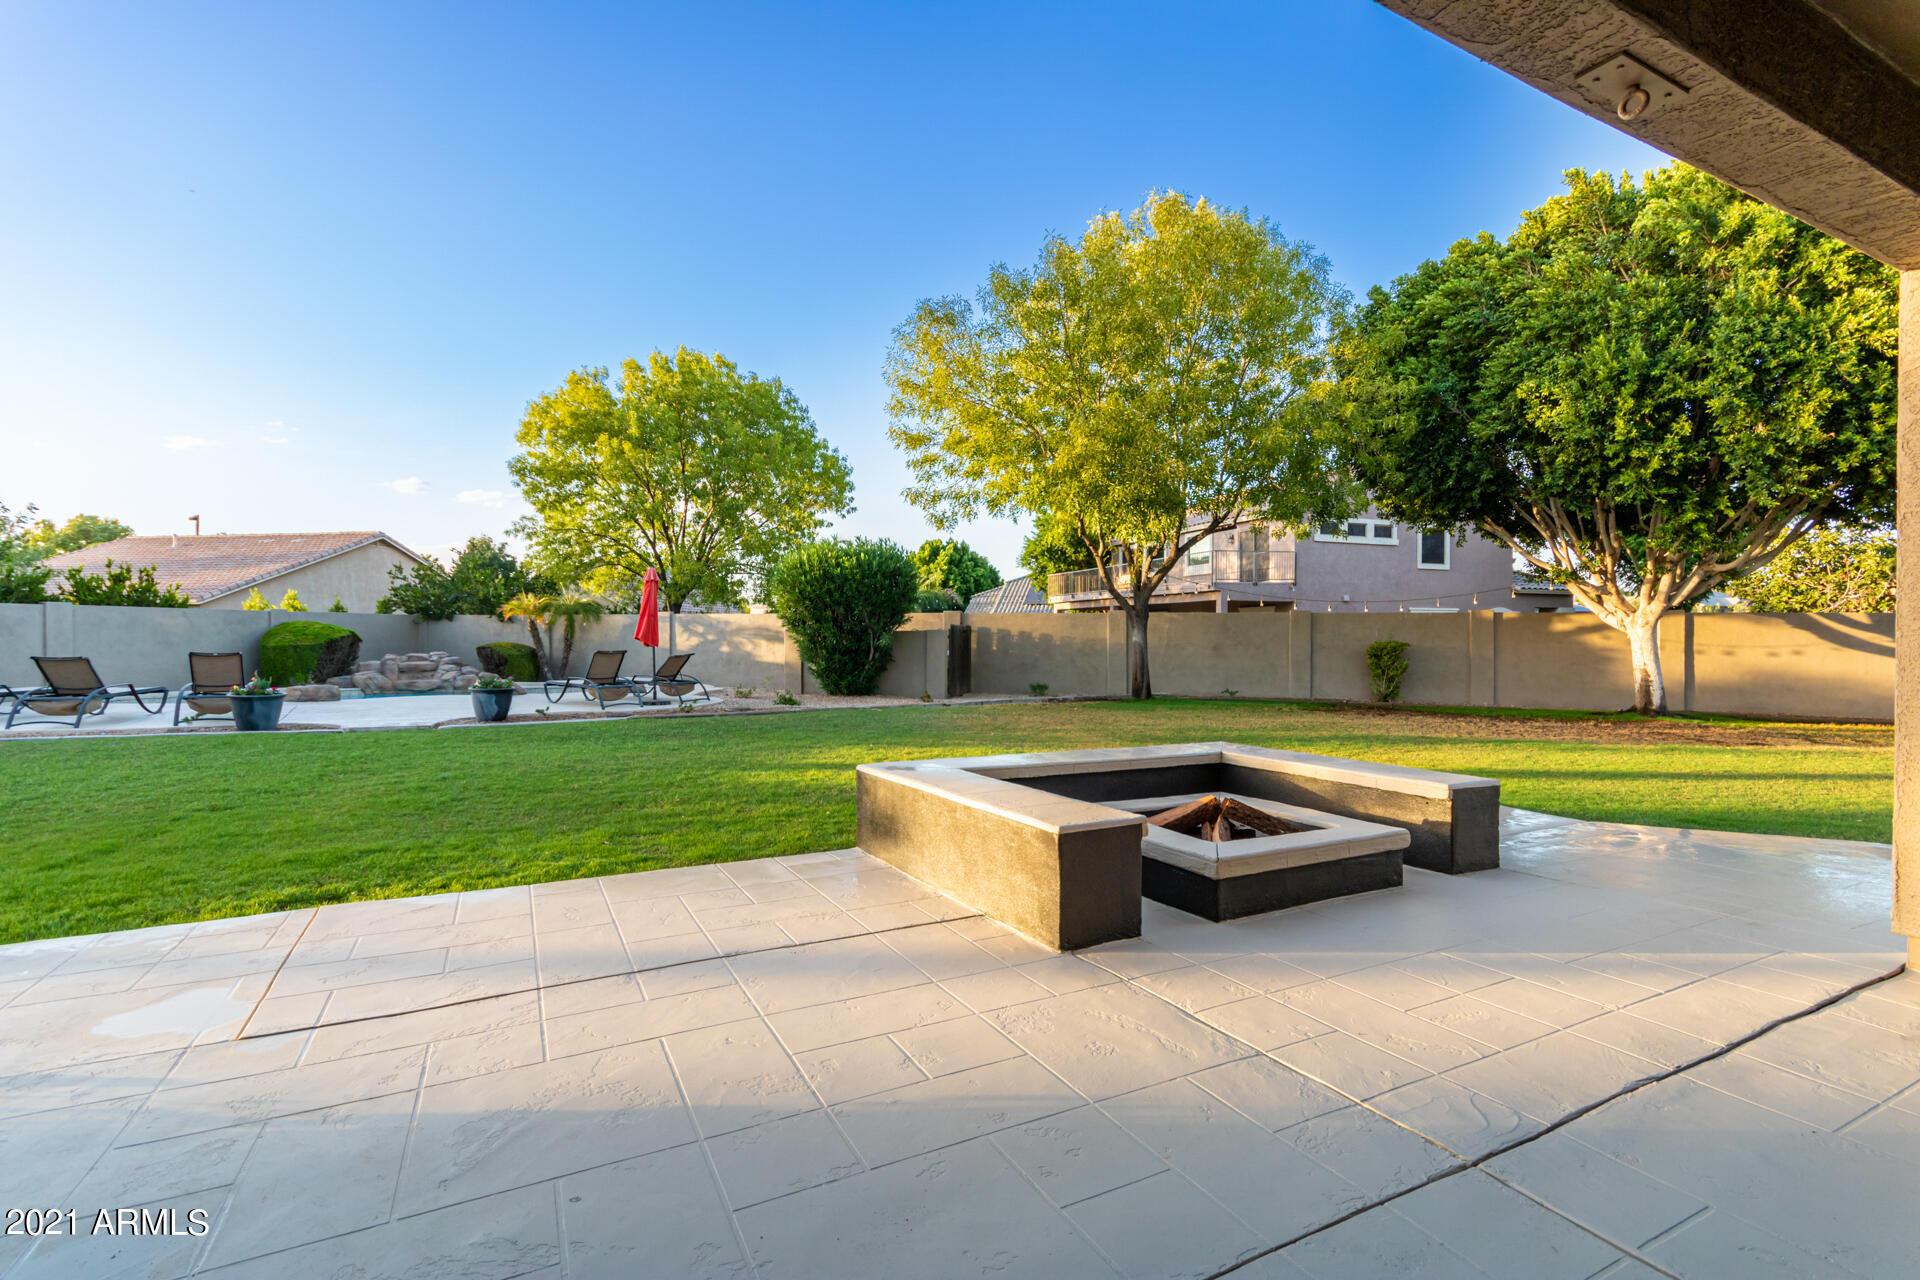 MLS 6306438 1098 S OAK Court, Gilbert, AZ 85233 4 Bedroom Homes